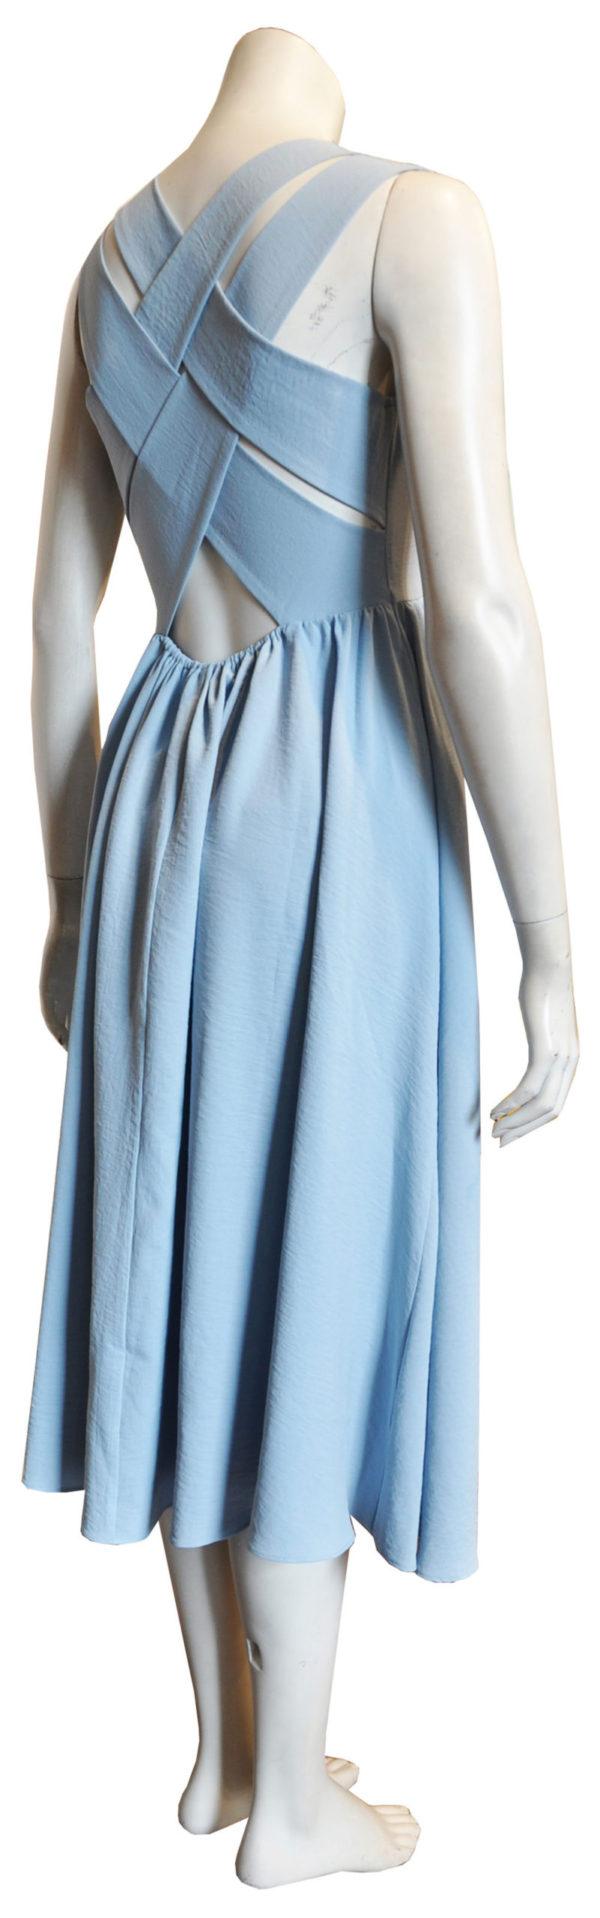 blue cross back dress- back